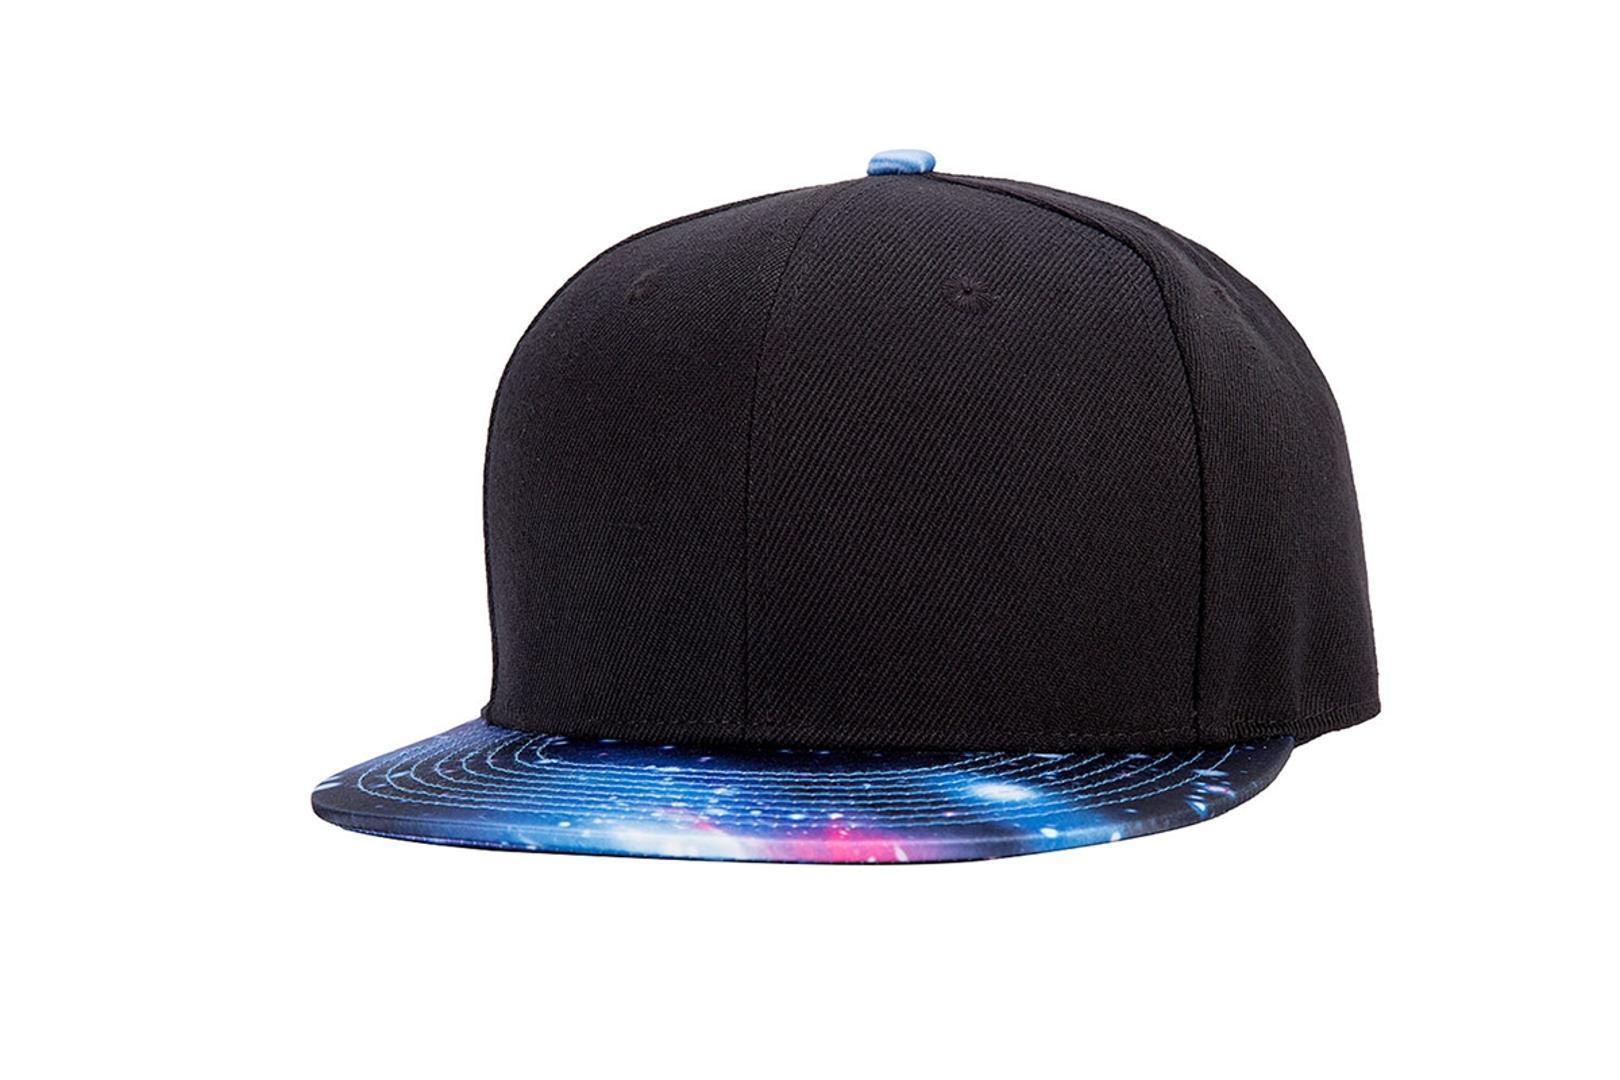 7e936842e3d 2018 Printed Cap Flat Brim Spring Outdoor Hats For Men Canvas ...